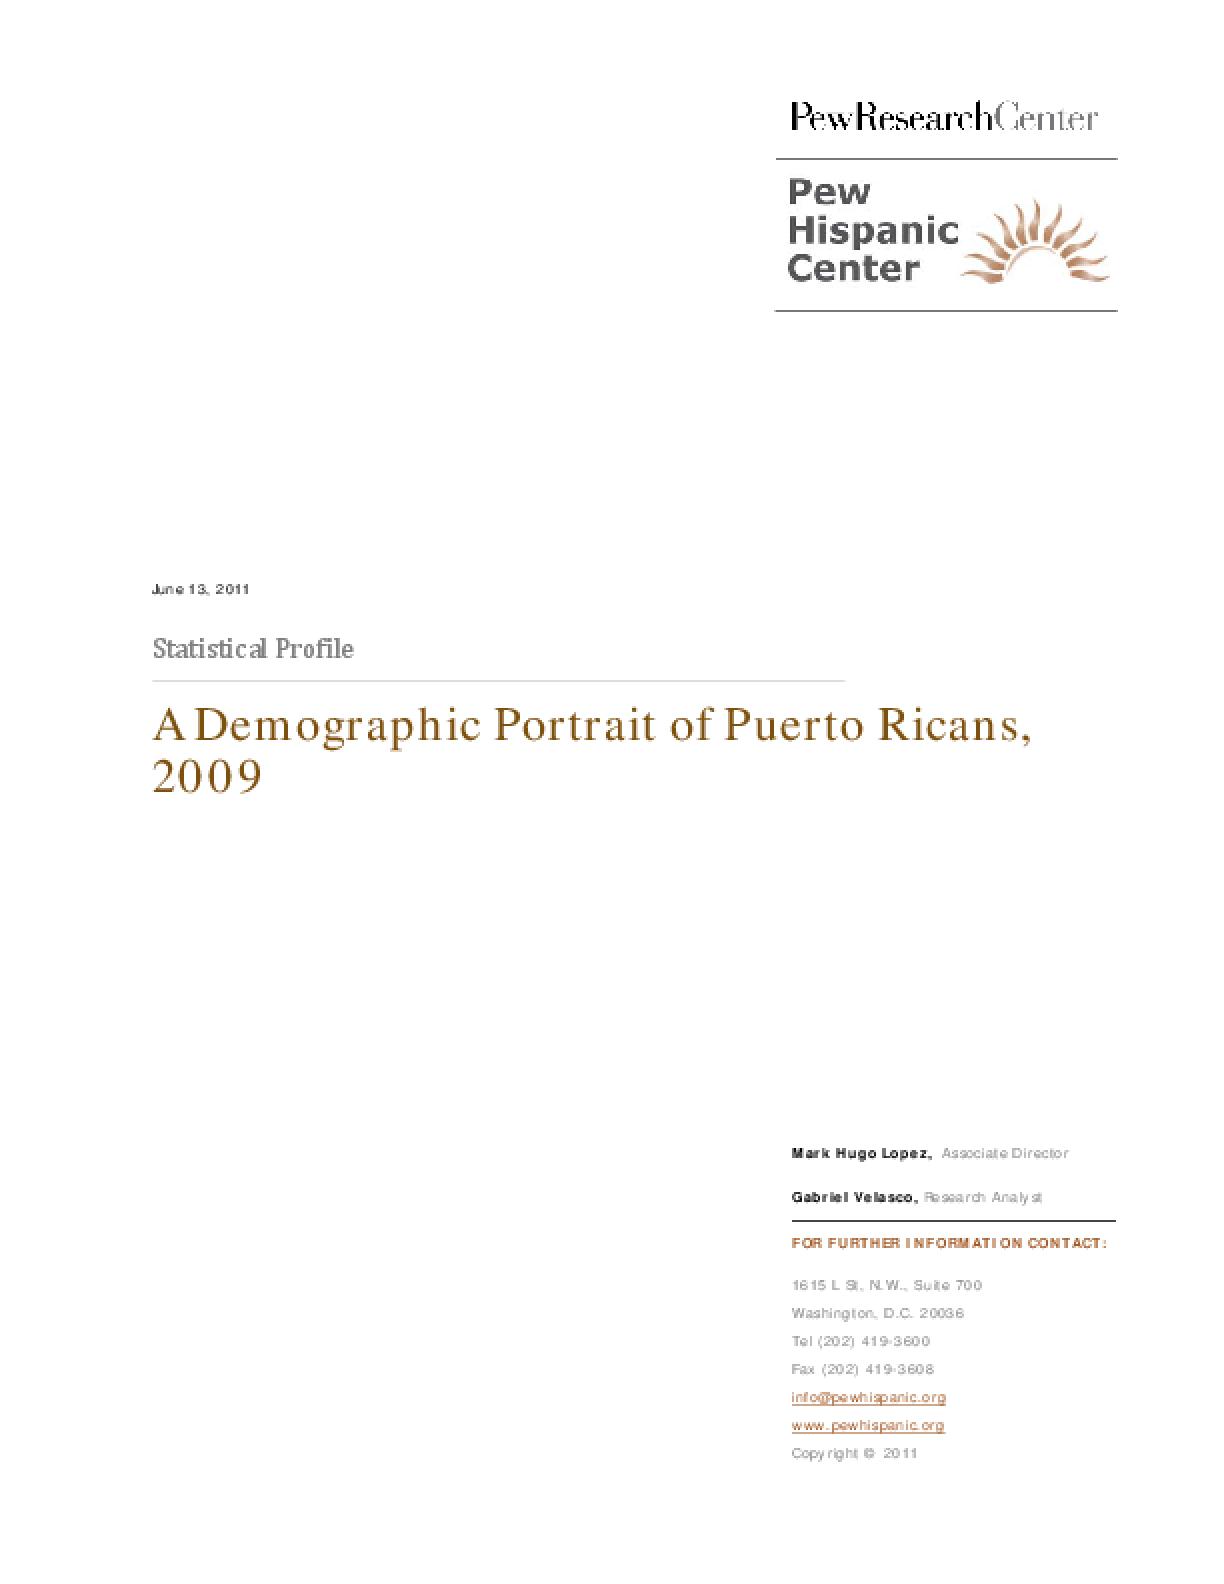 A Demographic Portrait of Hispanics in Puerto Rico